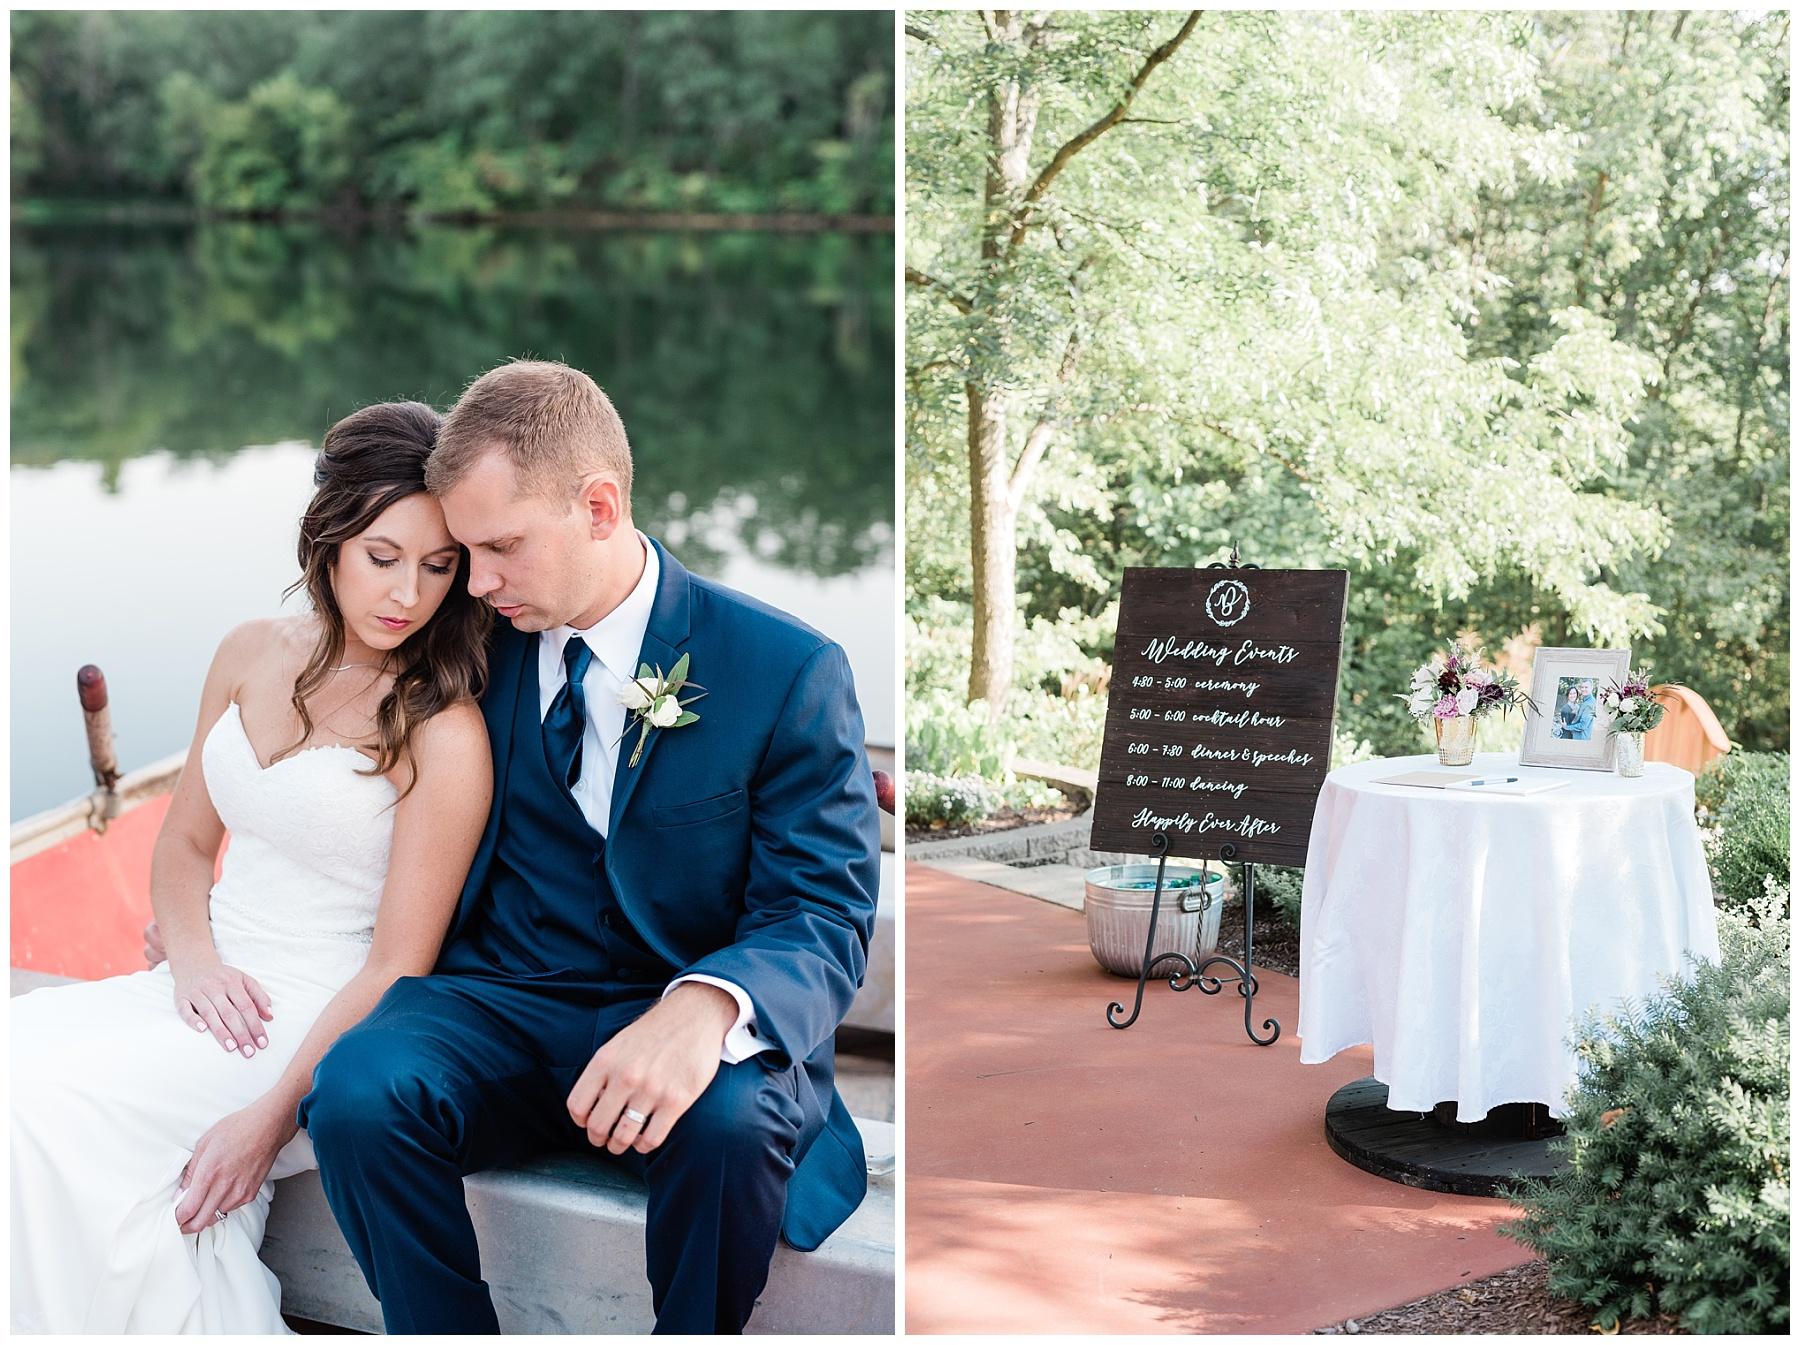 Romantic Summer Sunset Wedding Ceremony at Little Piney Lodge St. Louis Missouri by Kelsi Kliethermes Photography Fine Art Photographer_0034.jpg